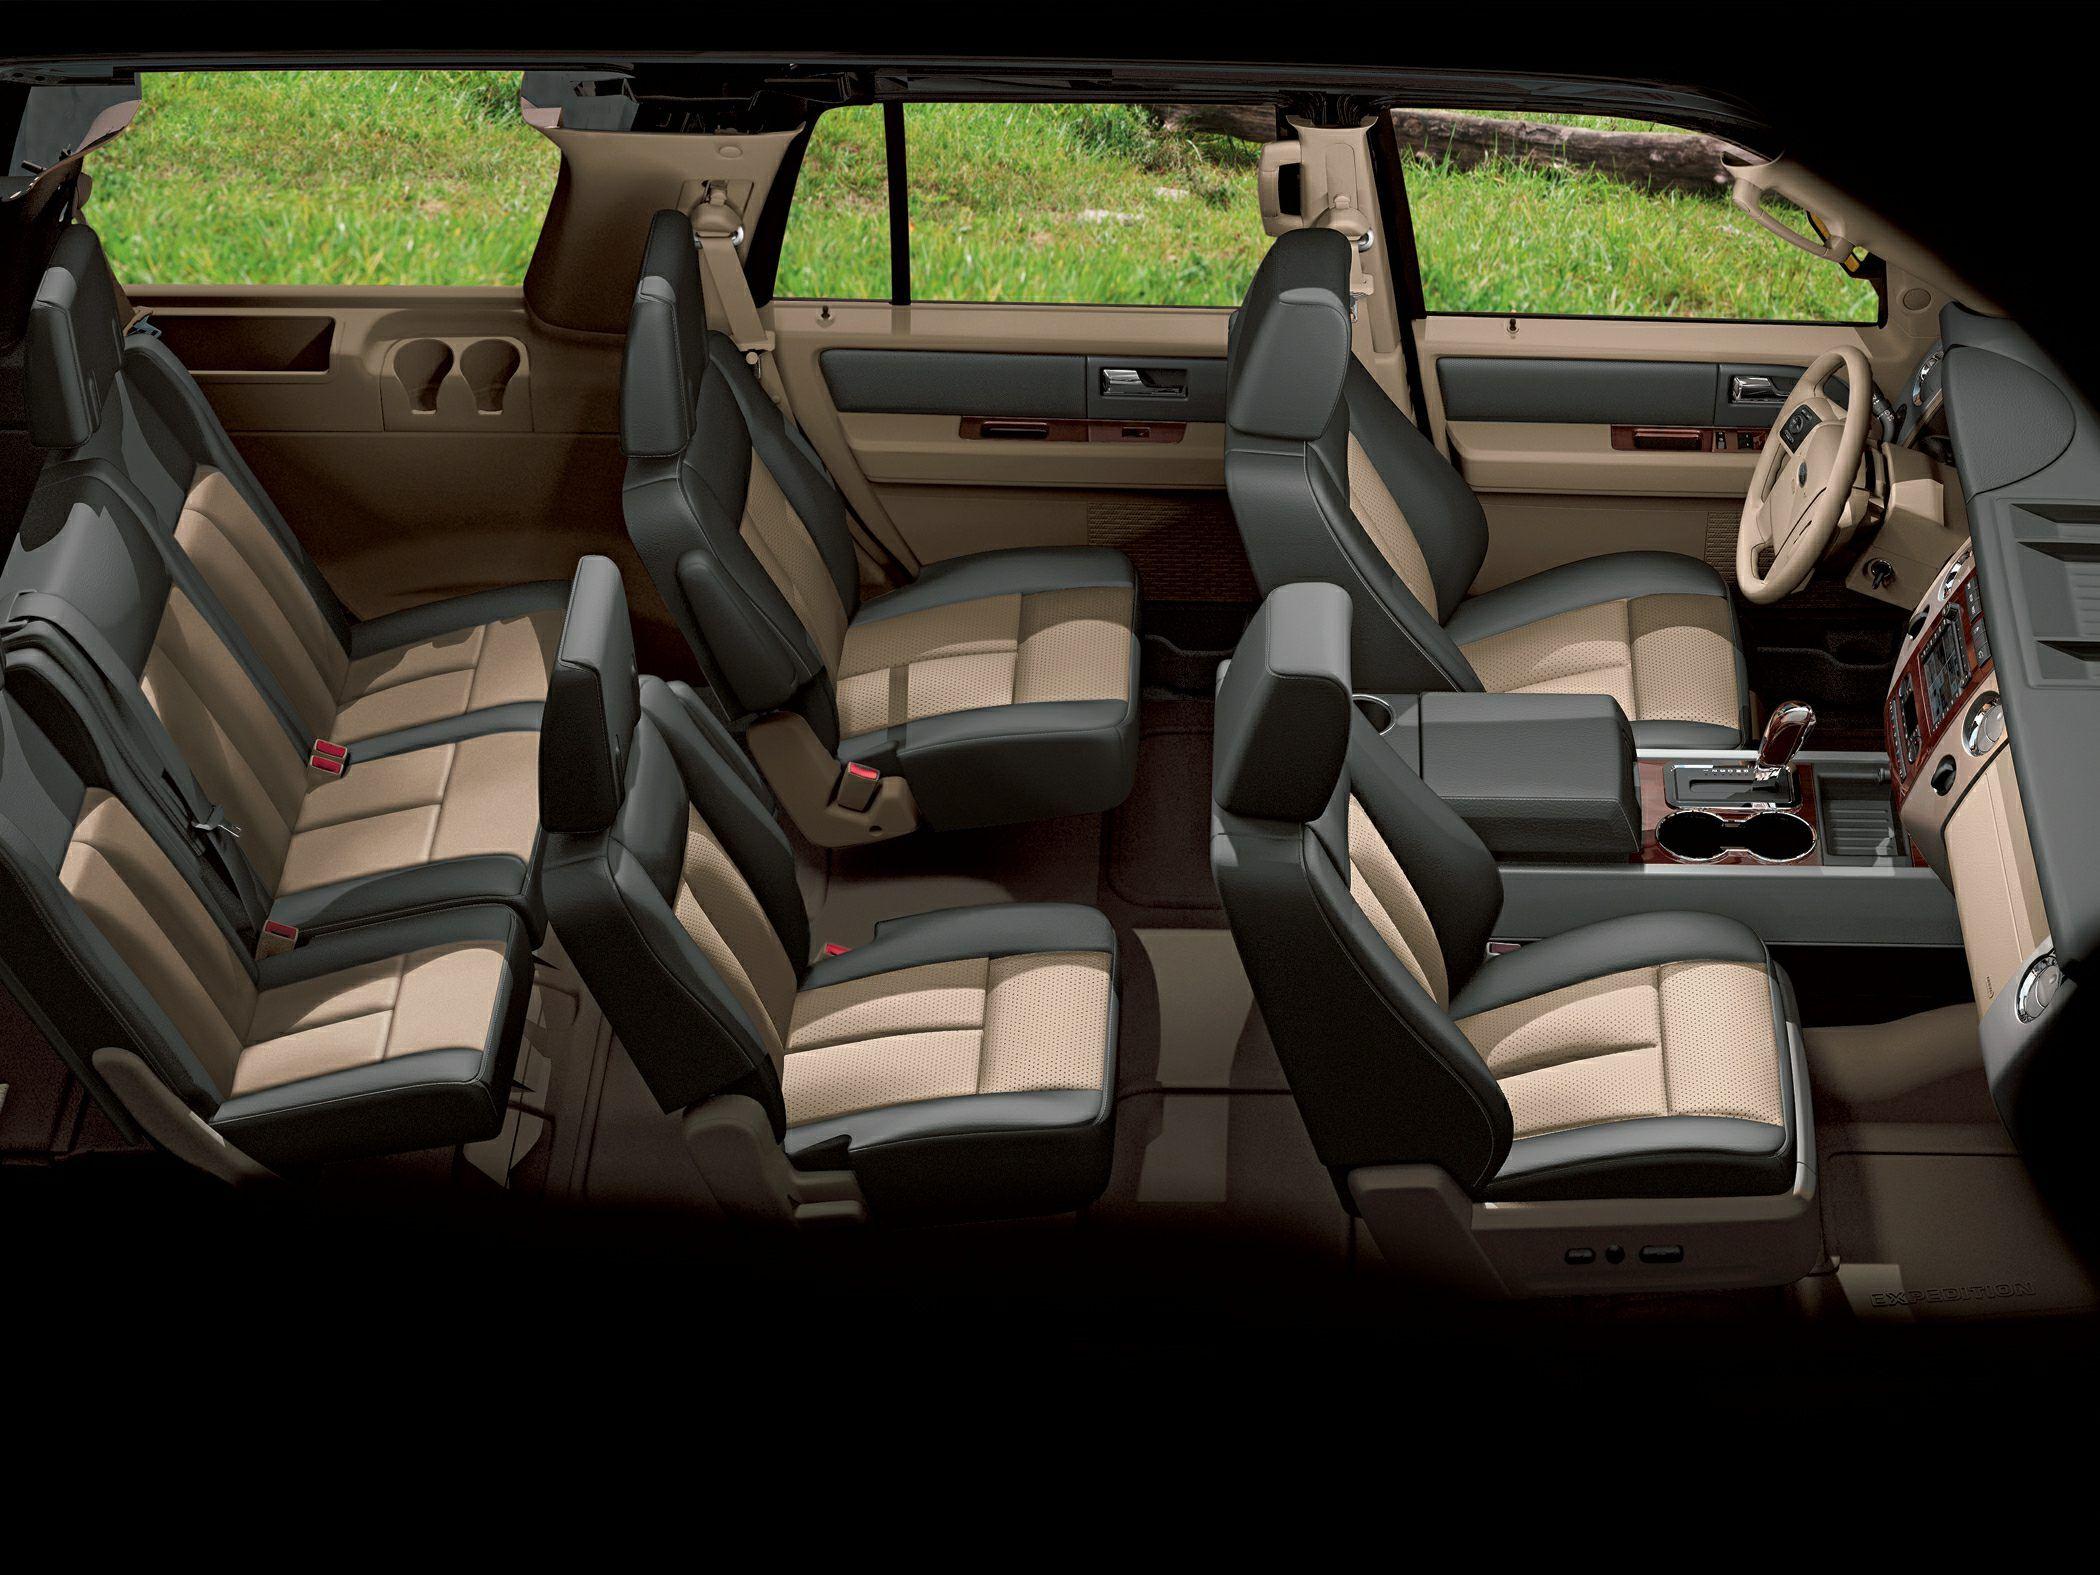 Suvs comfortably seat 7 passengers